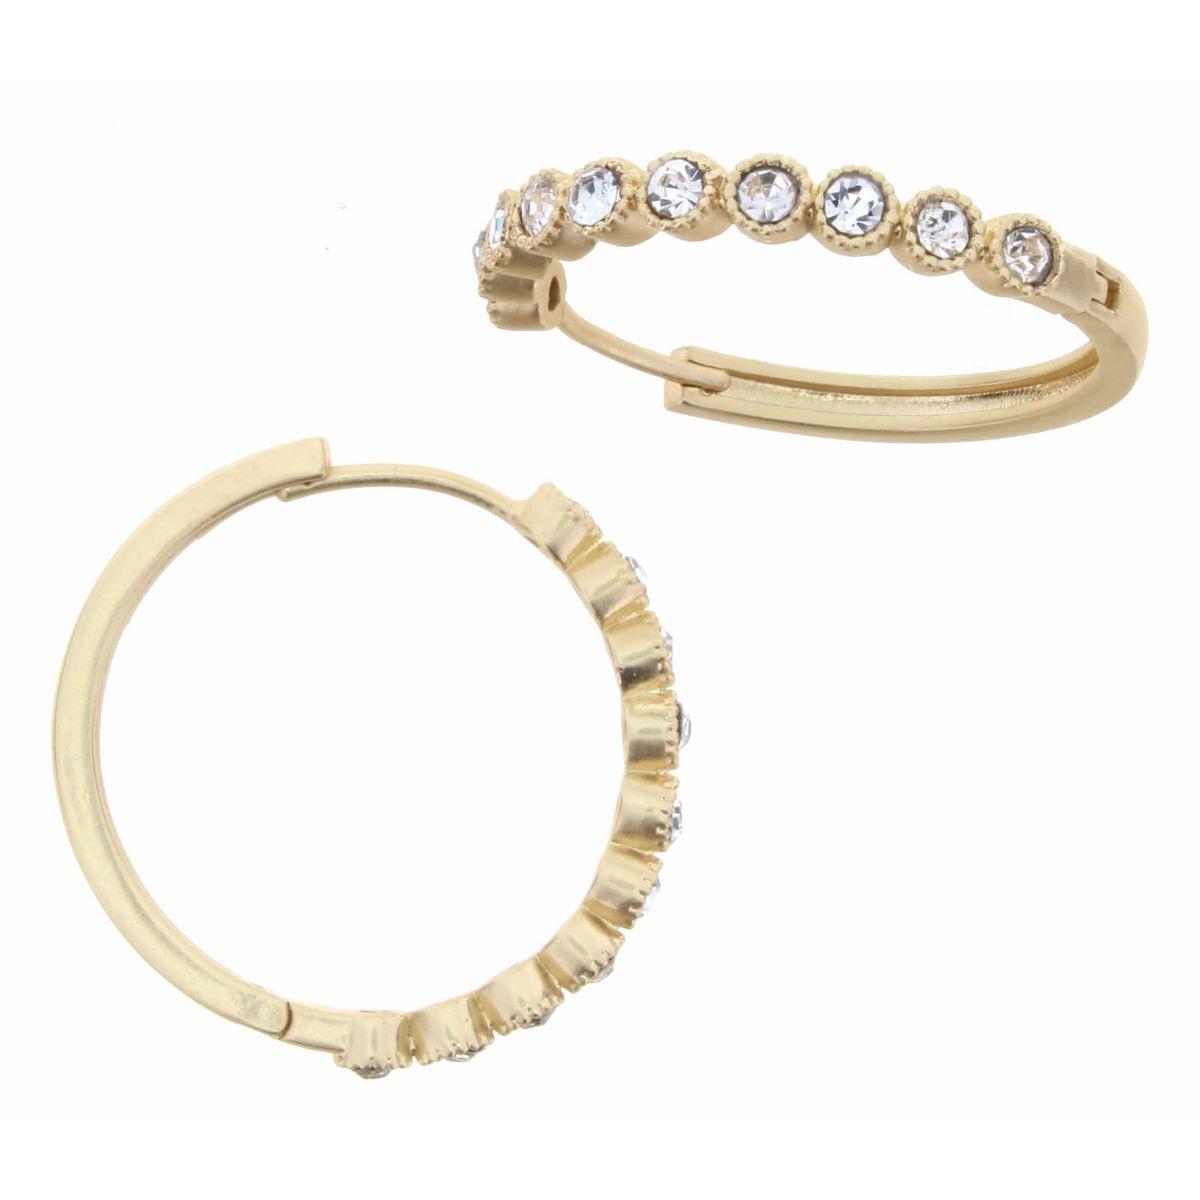 Gold Hoop With Clear Czech Embellishments Earrings